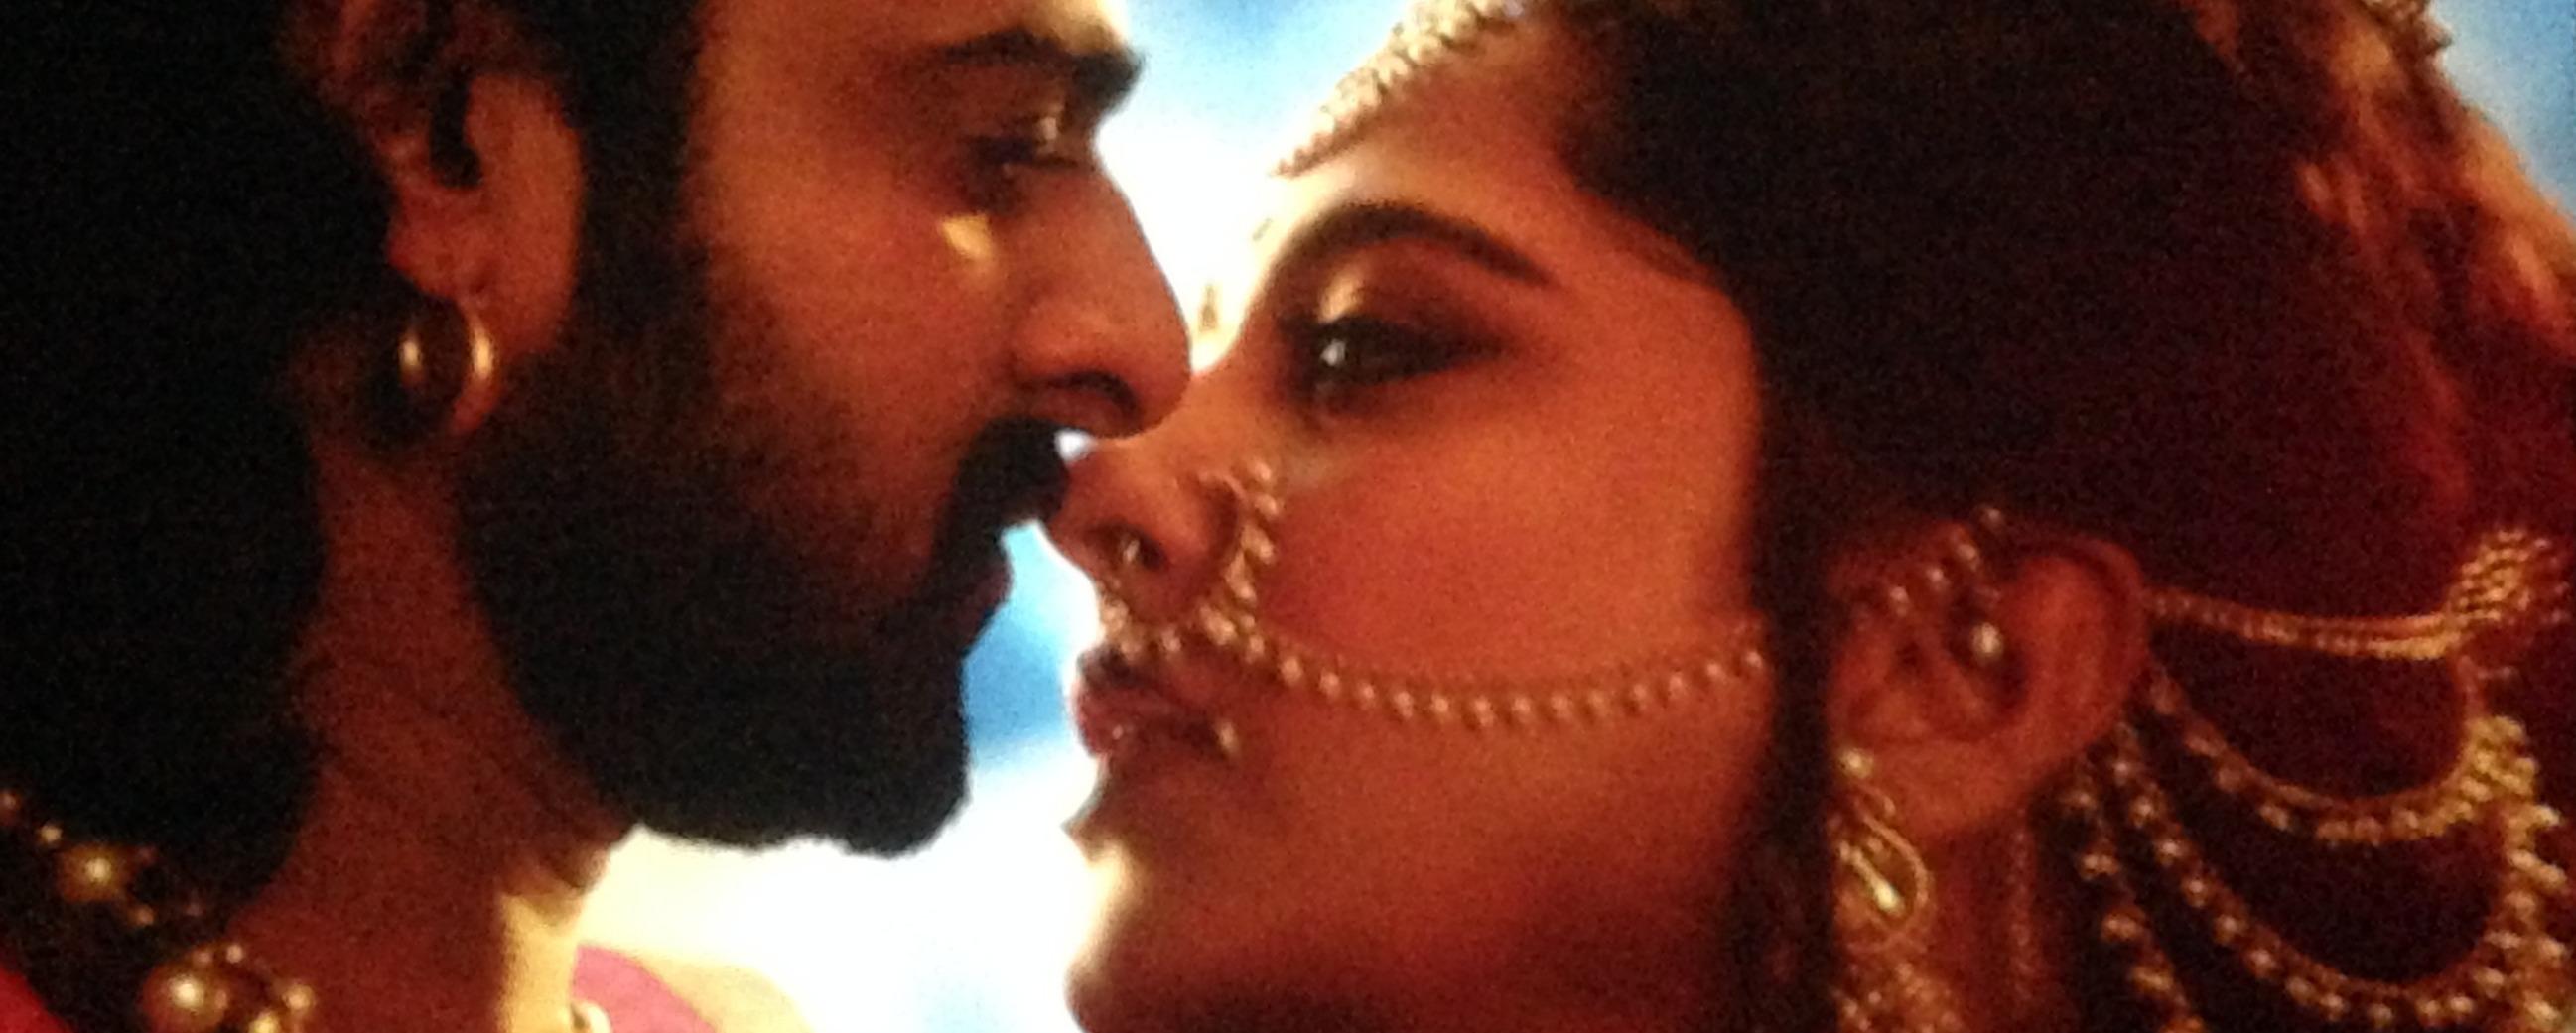 Anushka and Prabhas in Bahubali 2, Anushka Prabhas kiss in Bahubali 2